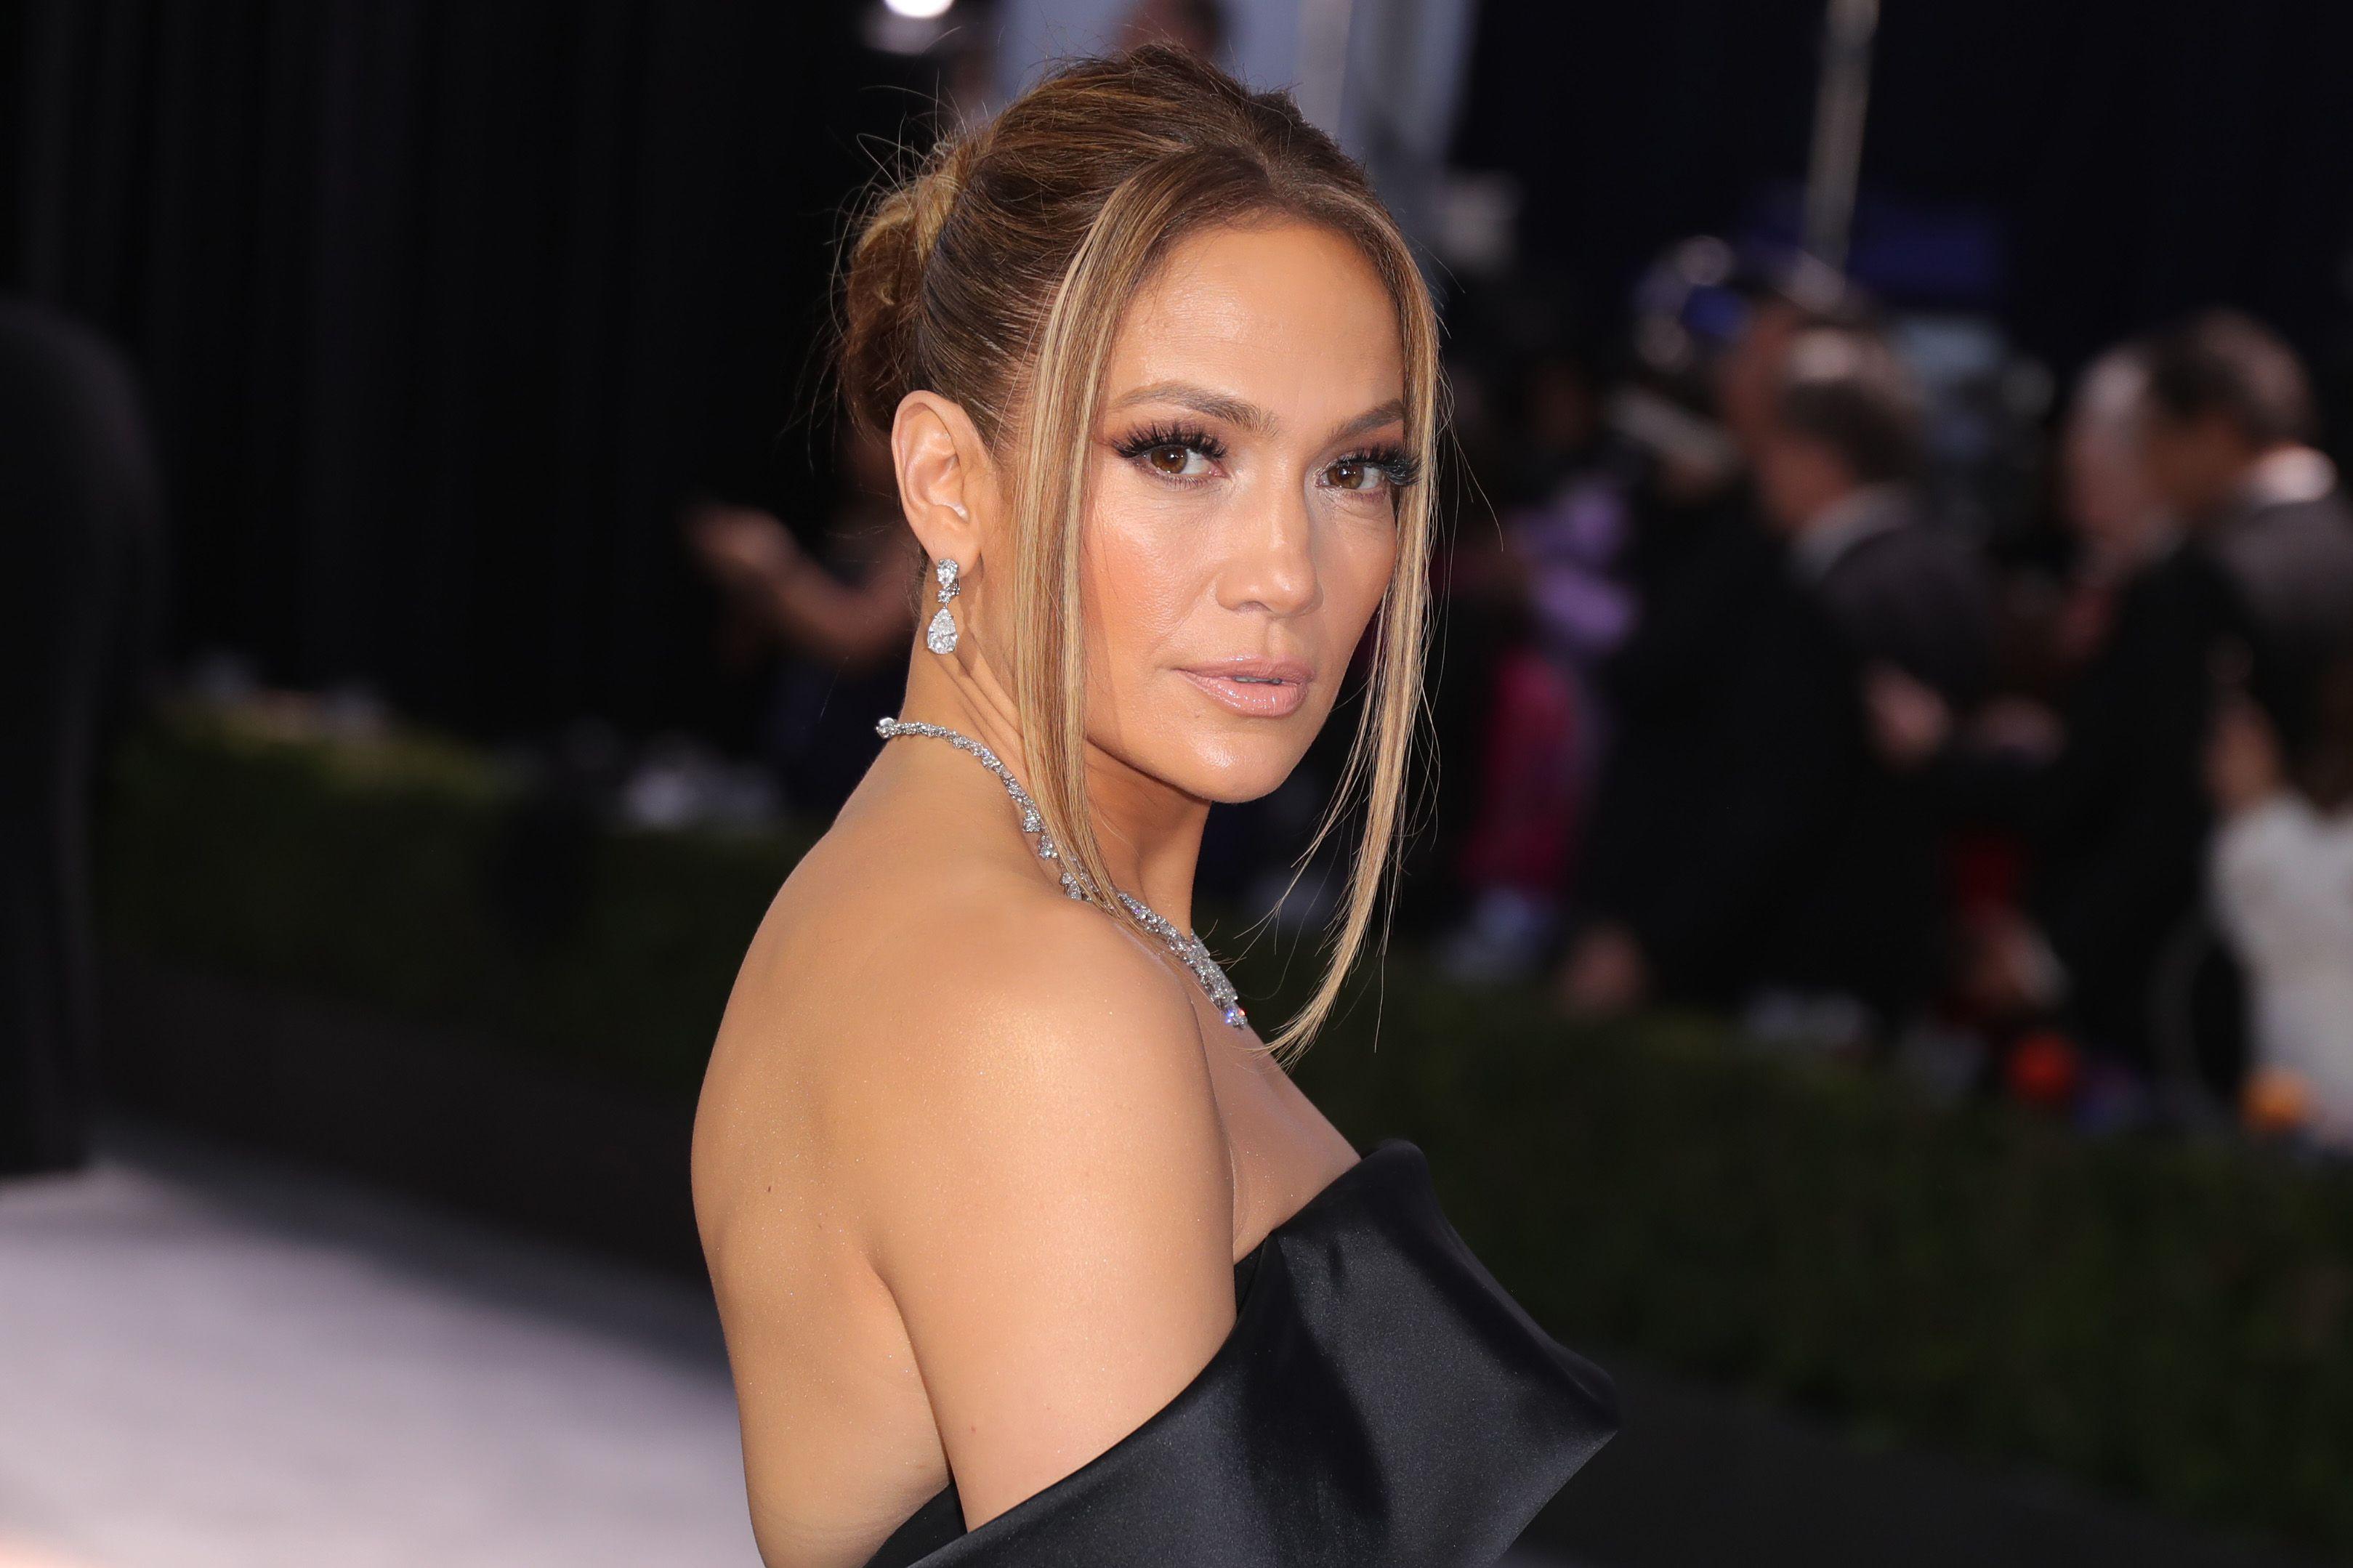 Um, Jennifer Lopez Casually Wore $9 Million Worth of Diamonds to the SAG Awards